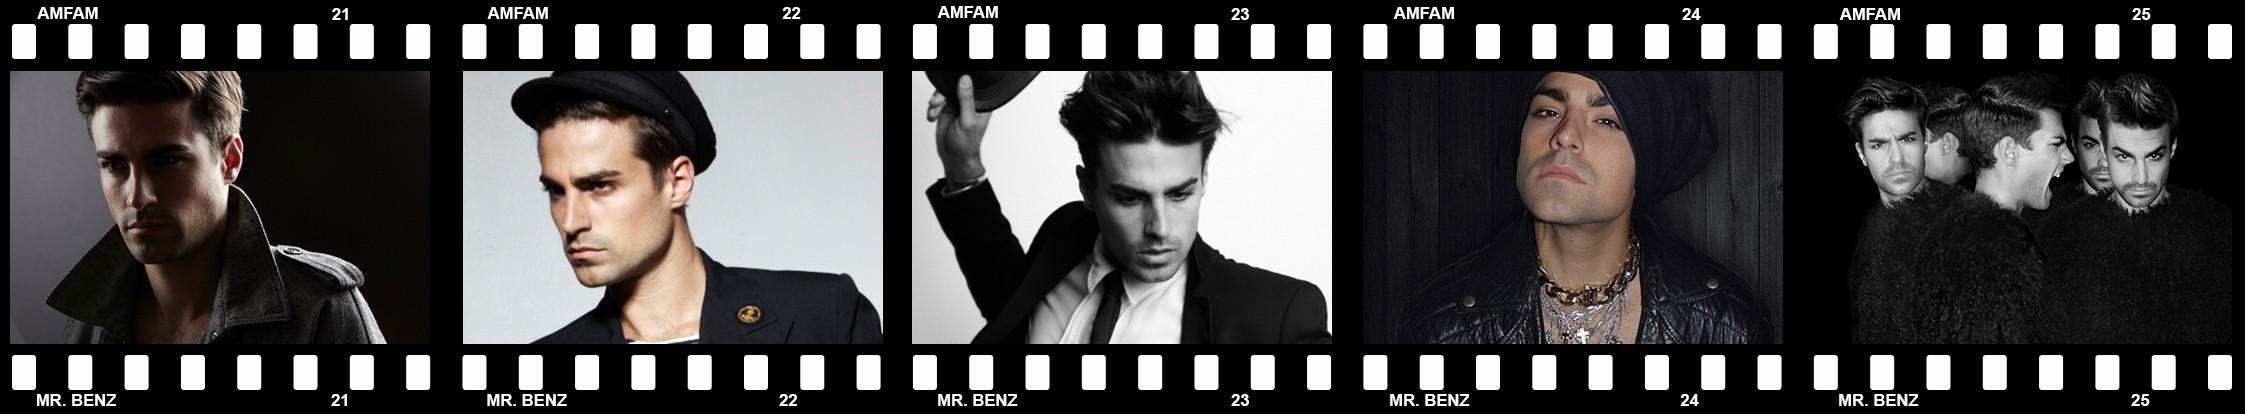 Mr benz